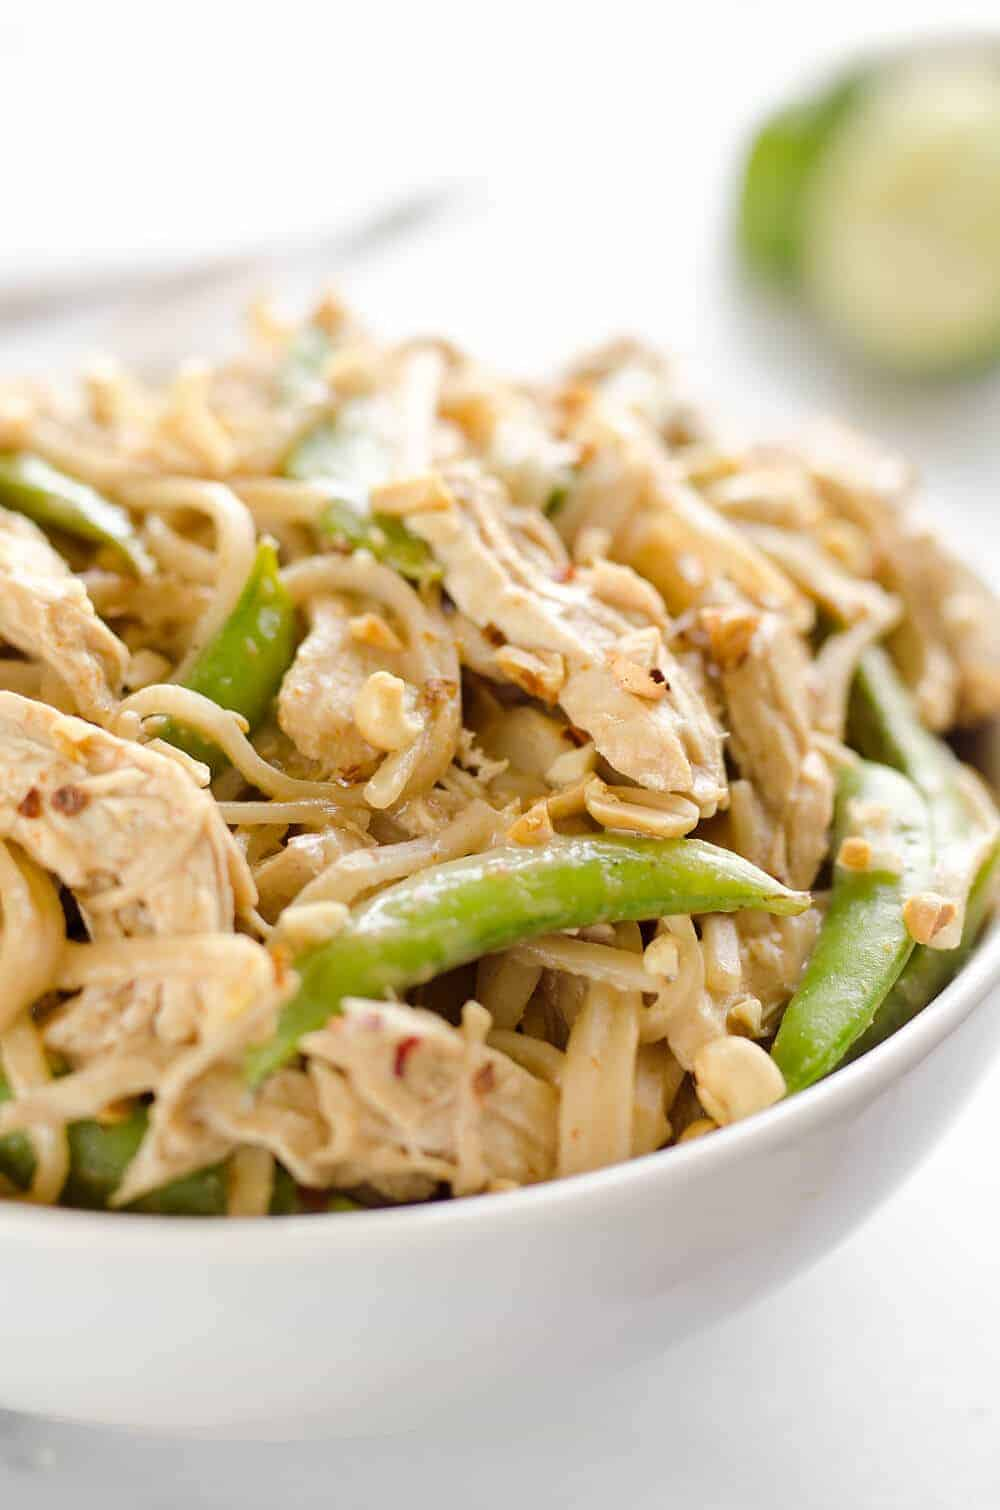 Pressure Cooker Tai Peanut Chicken Noodles | 12 Favorite Instapot Recipes